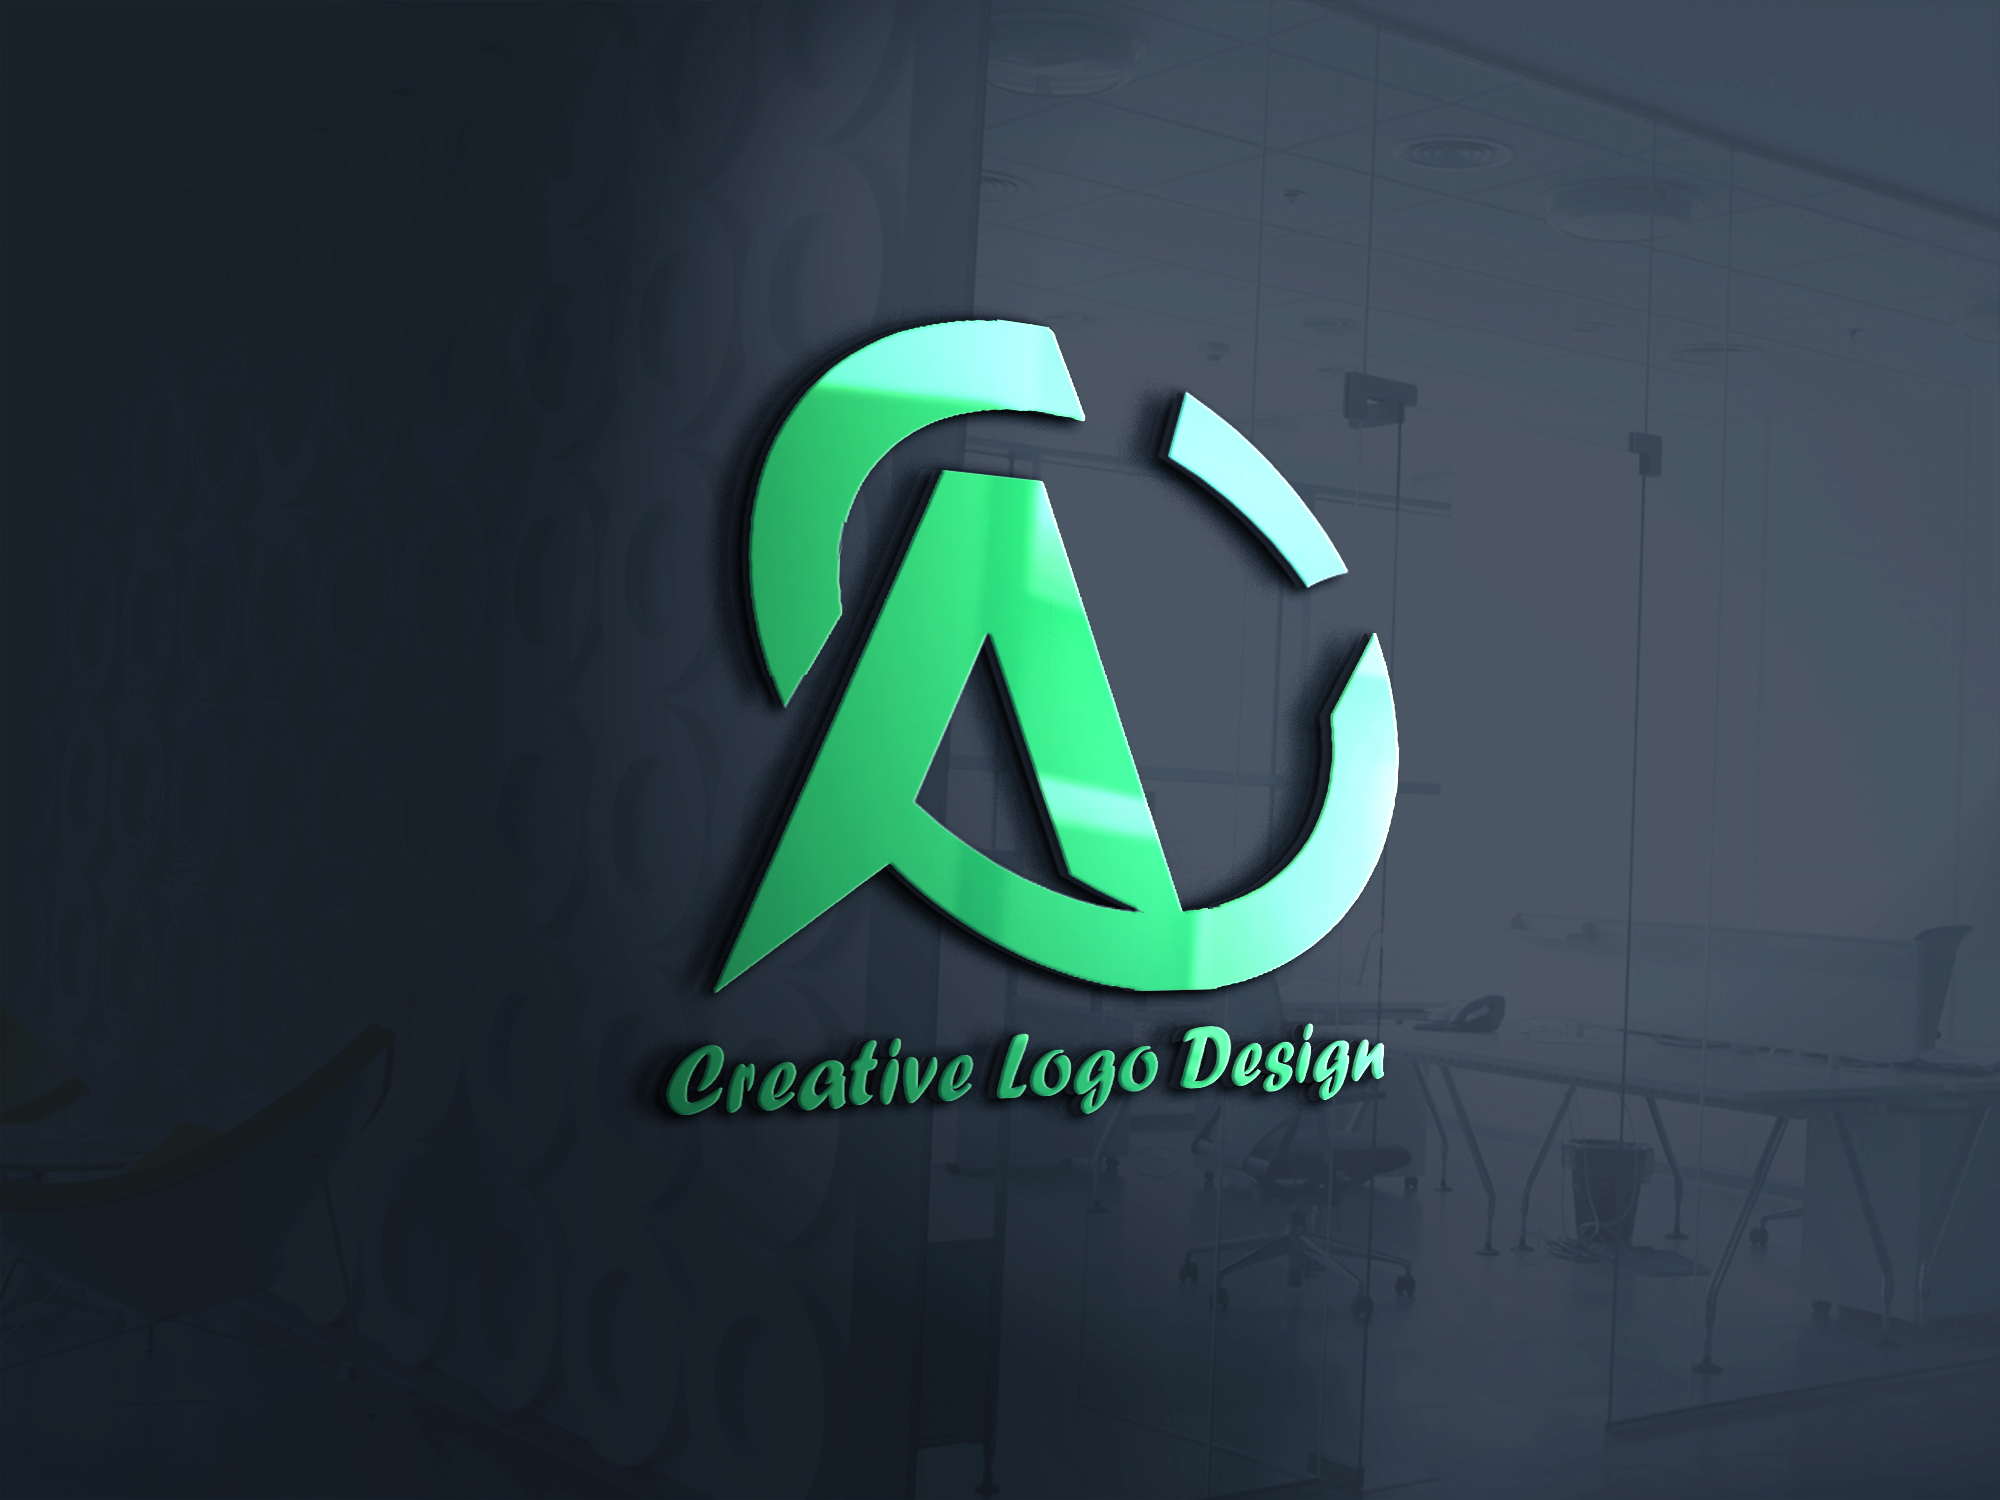 Photoshop Editing and Logo design